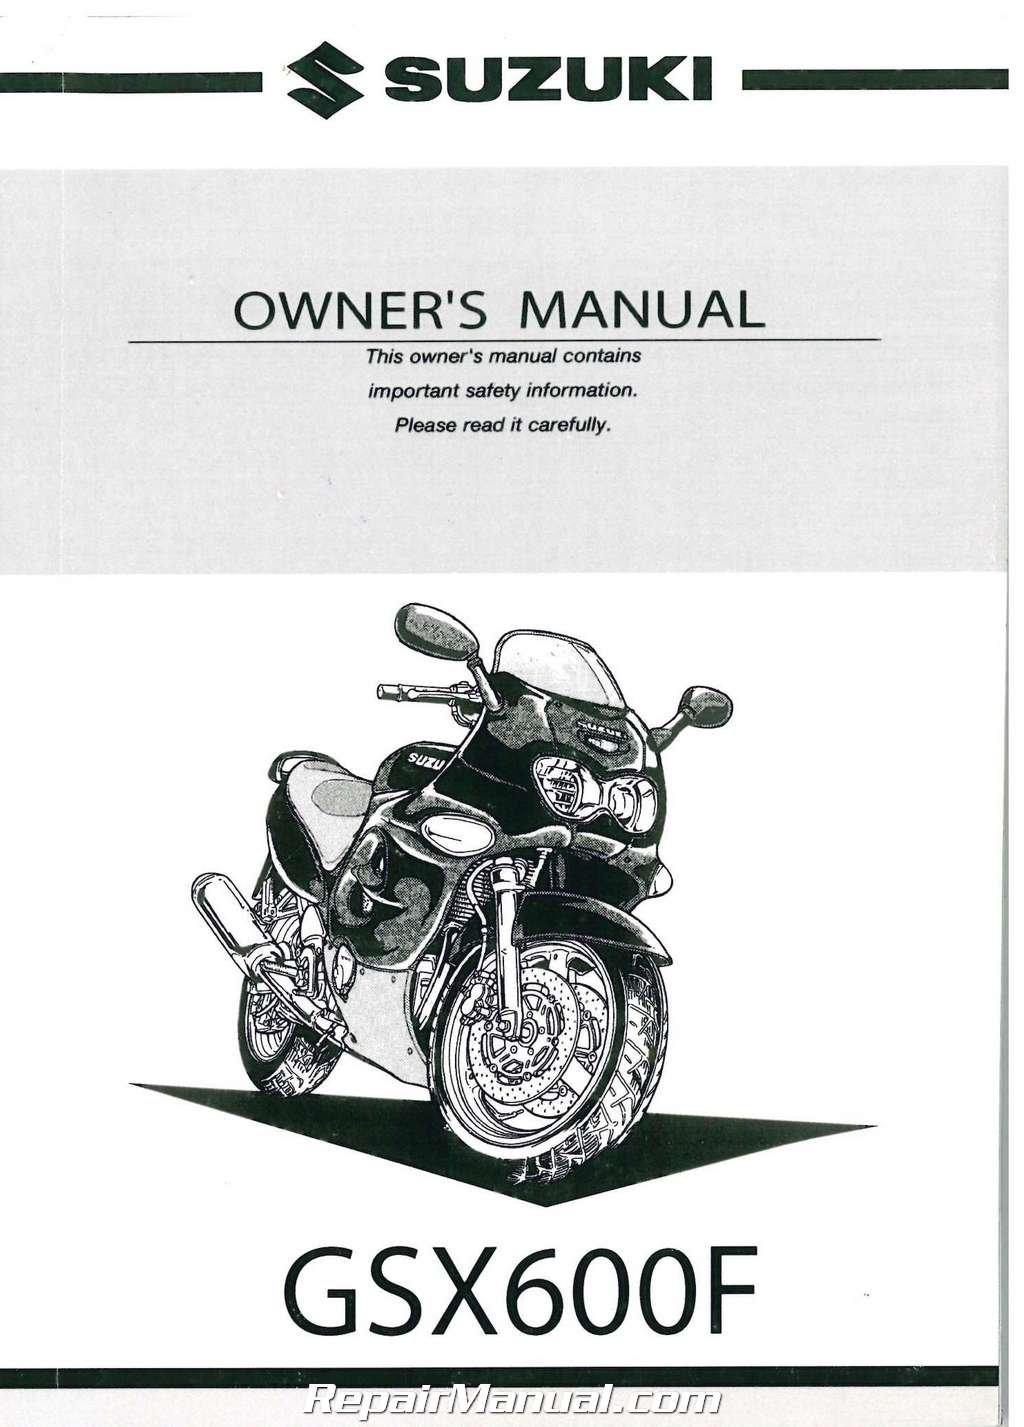 99011-19C63-03A 2001 Suzuki Katana GSX600F Motorcycle Owners ...